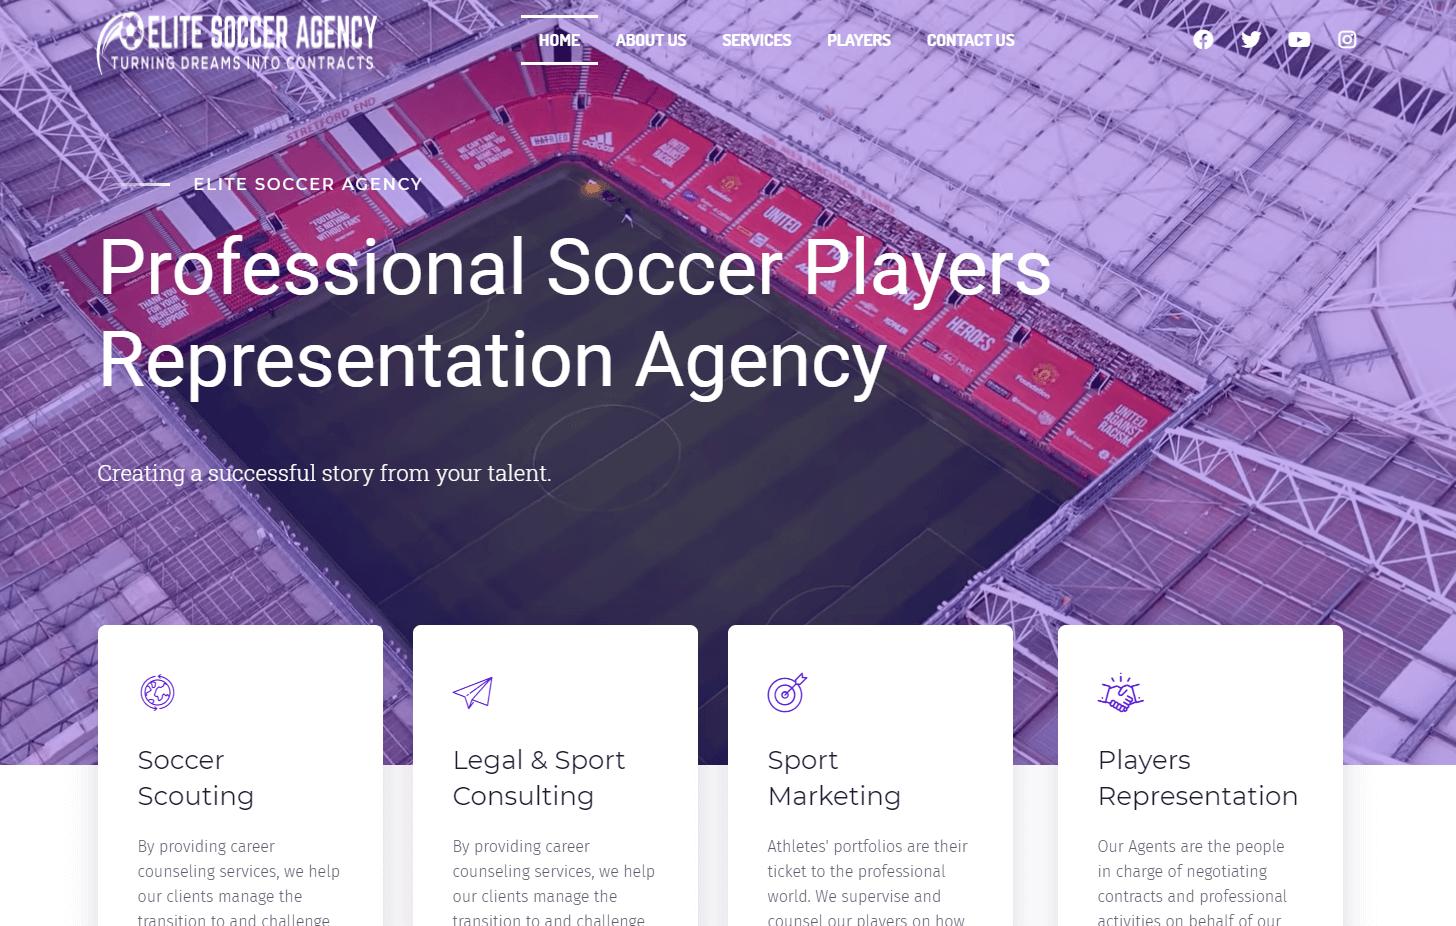 Elite-Soccer-Agency | wing-my-web